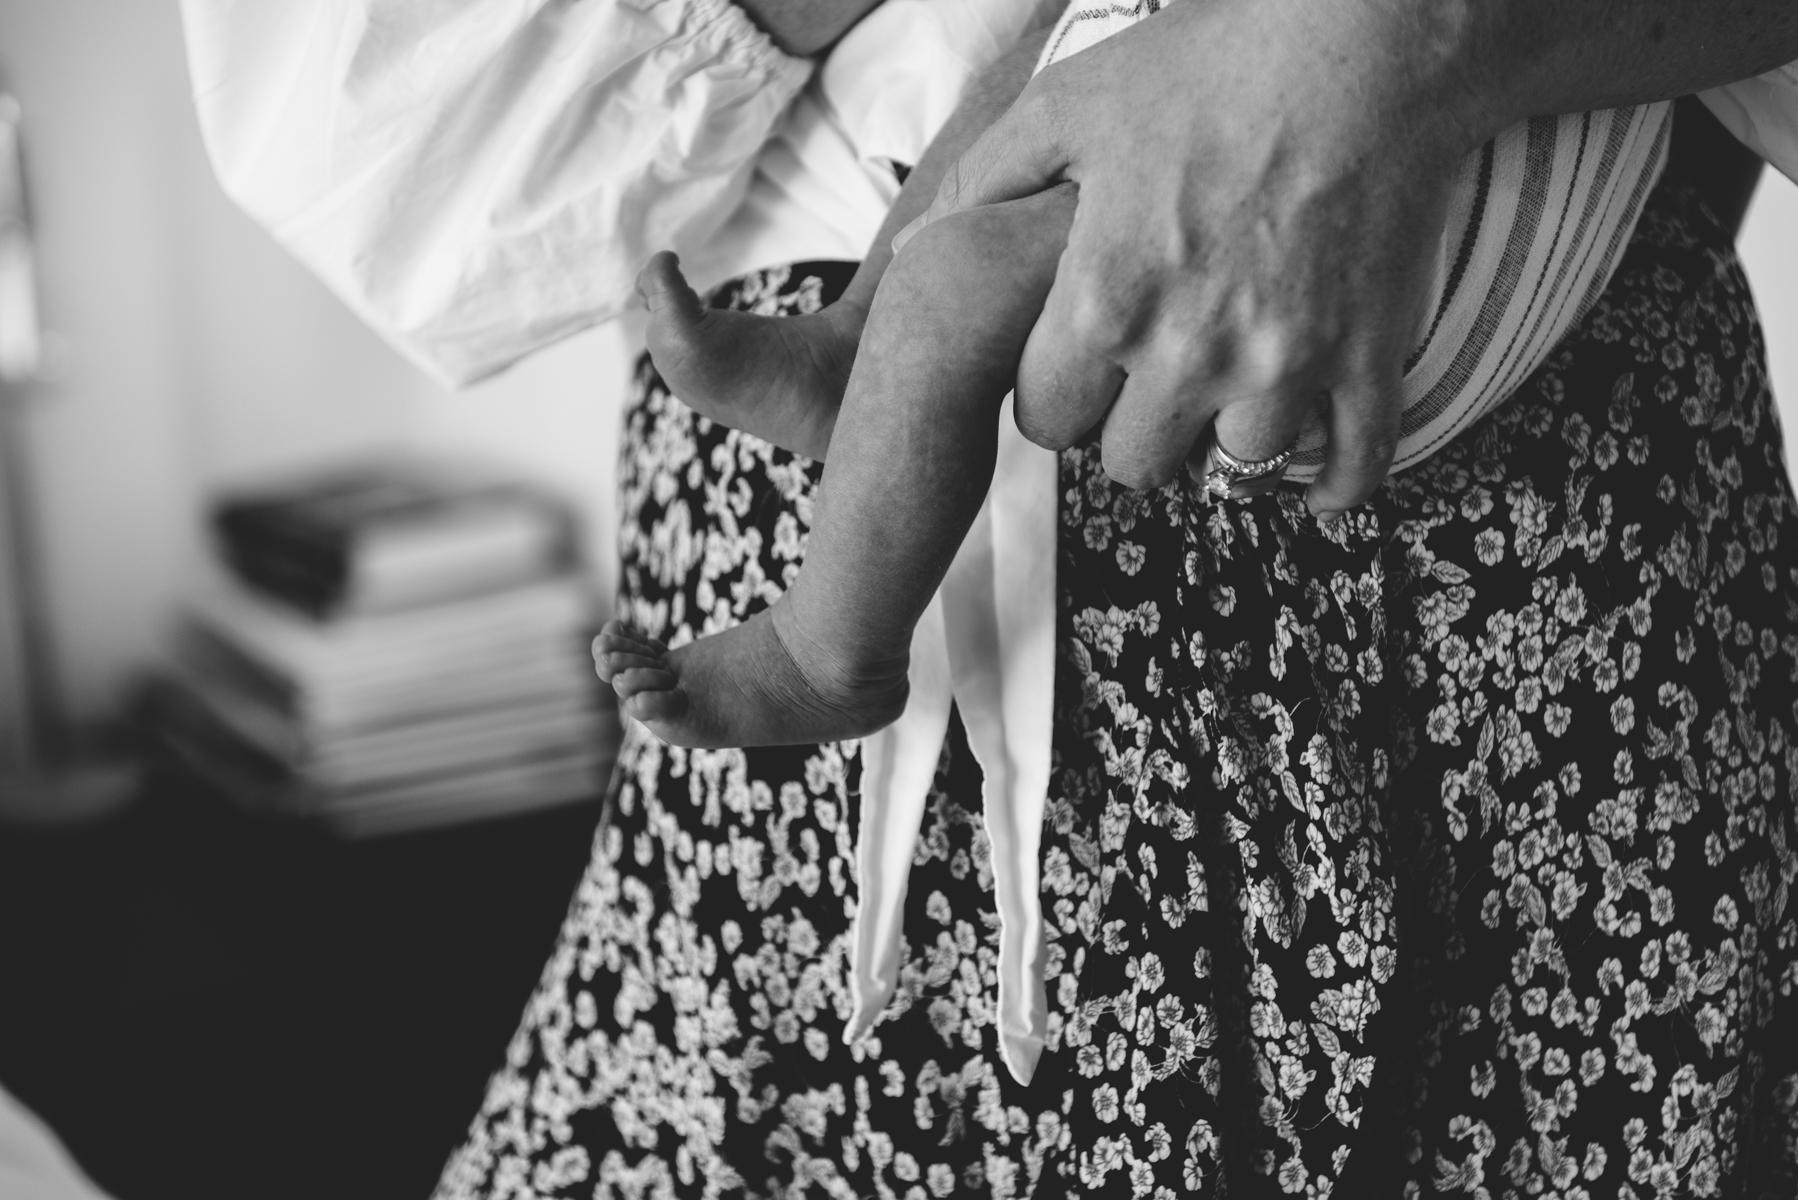 Finn-family-wedding- skyla sage photography weddings, families, byron bay,tweed coast,kingscliff,cabarita,gold coast-65.jpg